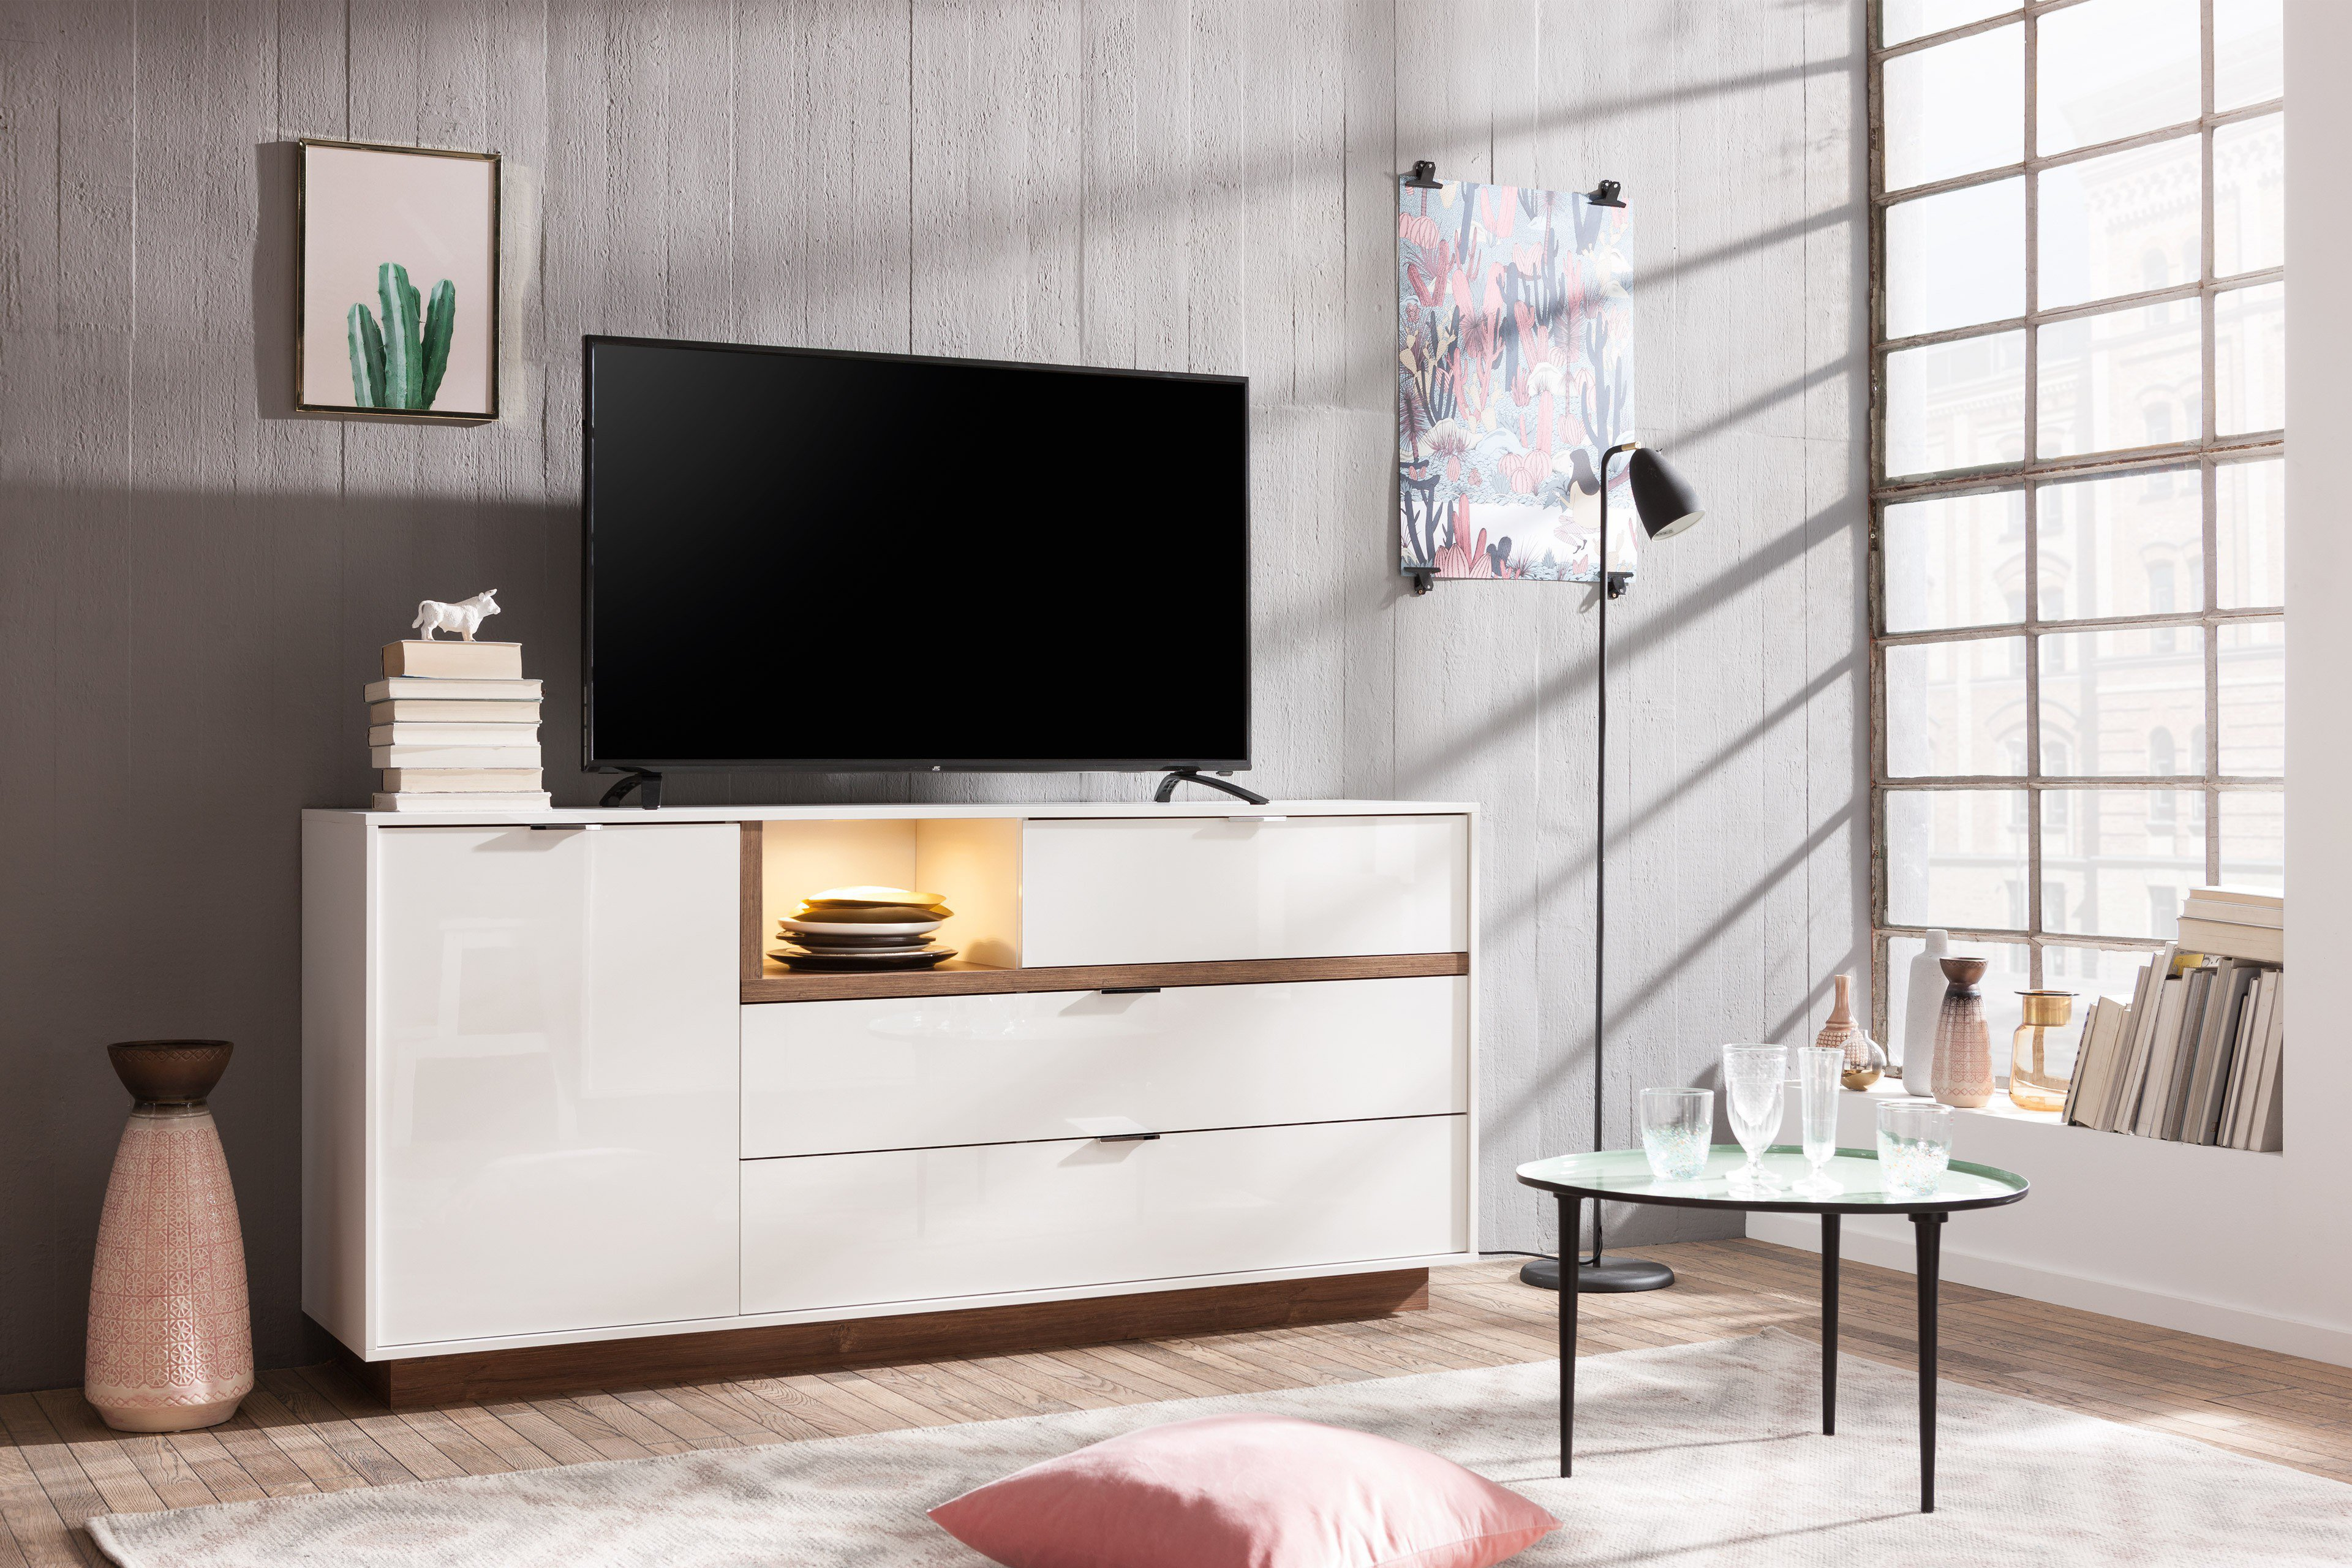 cs schmalm bel sideboard my ell wei stirling eiche m bel letz ihr online shop. Black Bedroom Furniture Sets. Home Design Ideas